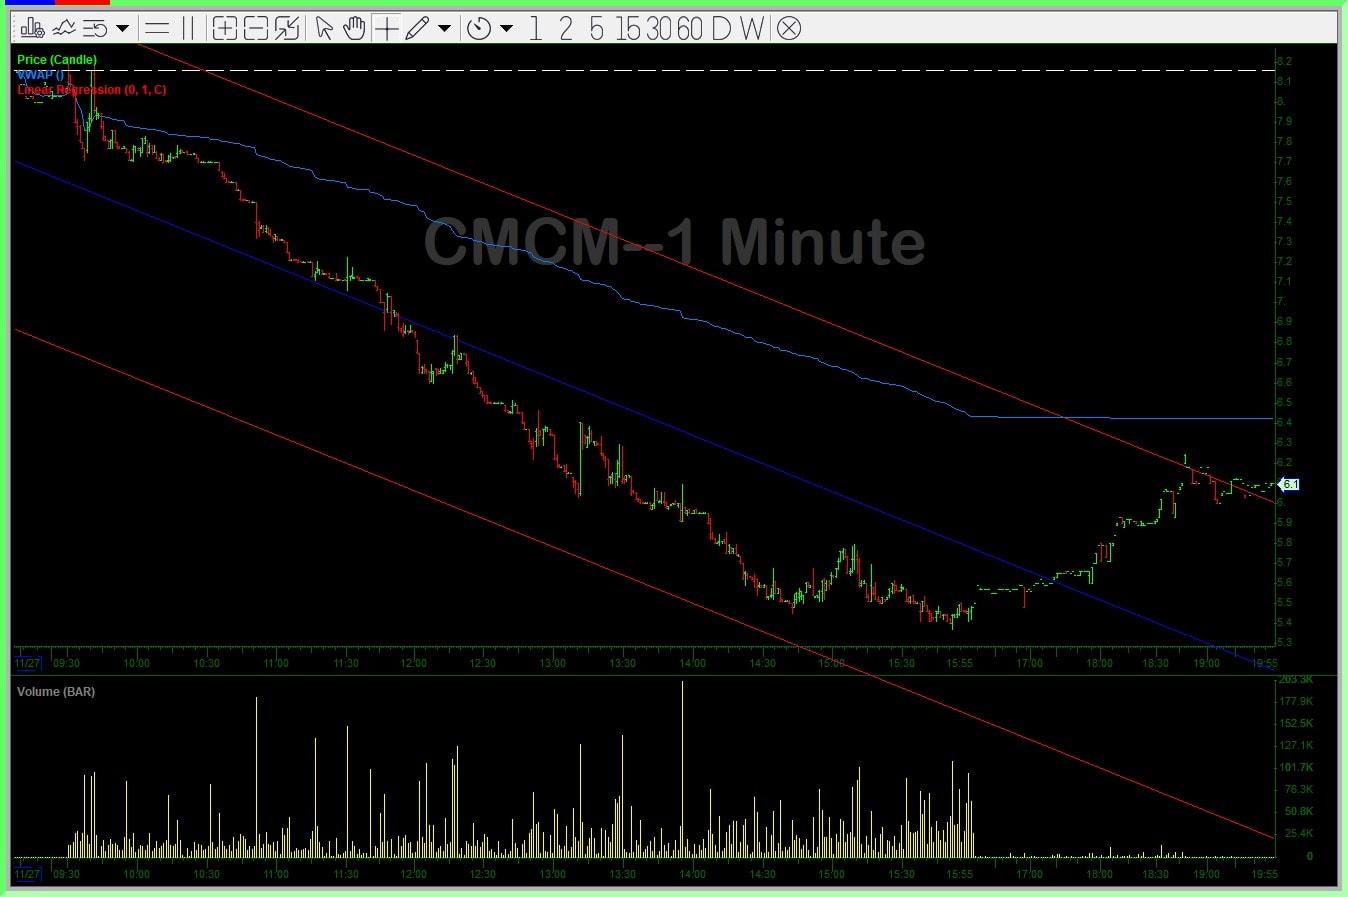 CMCM Chart